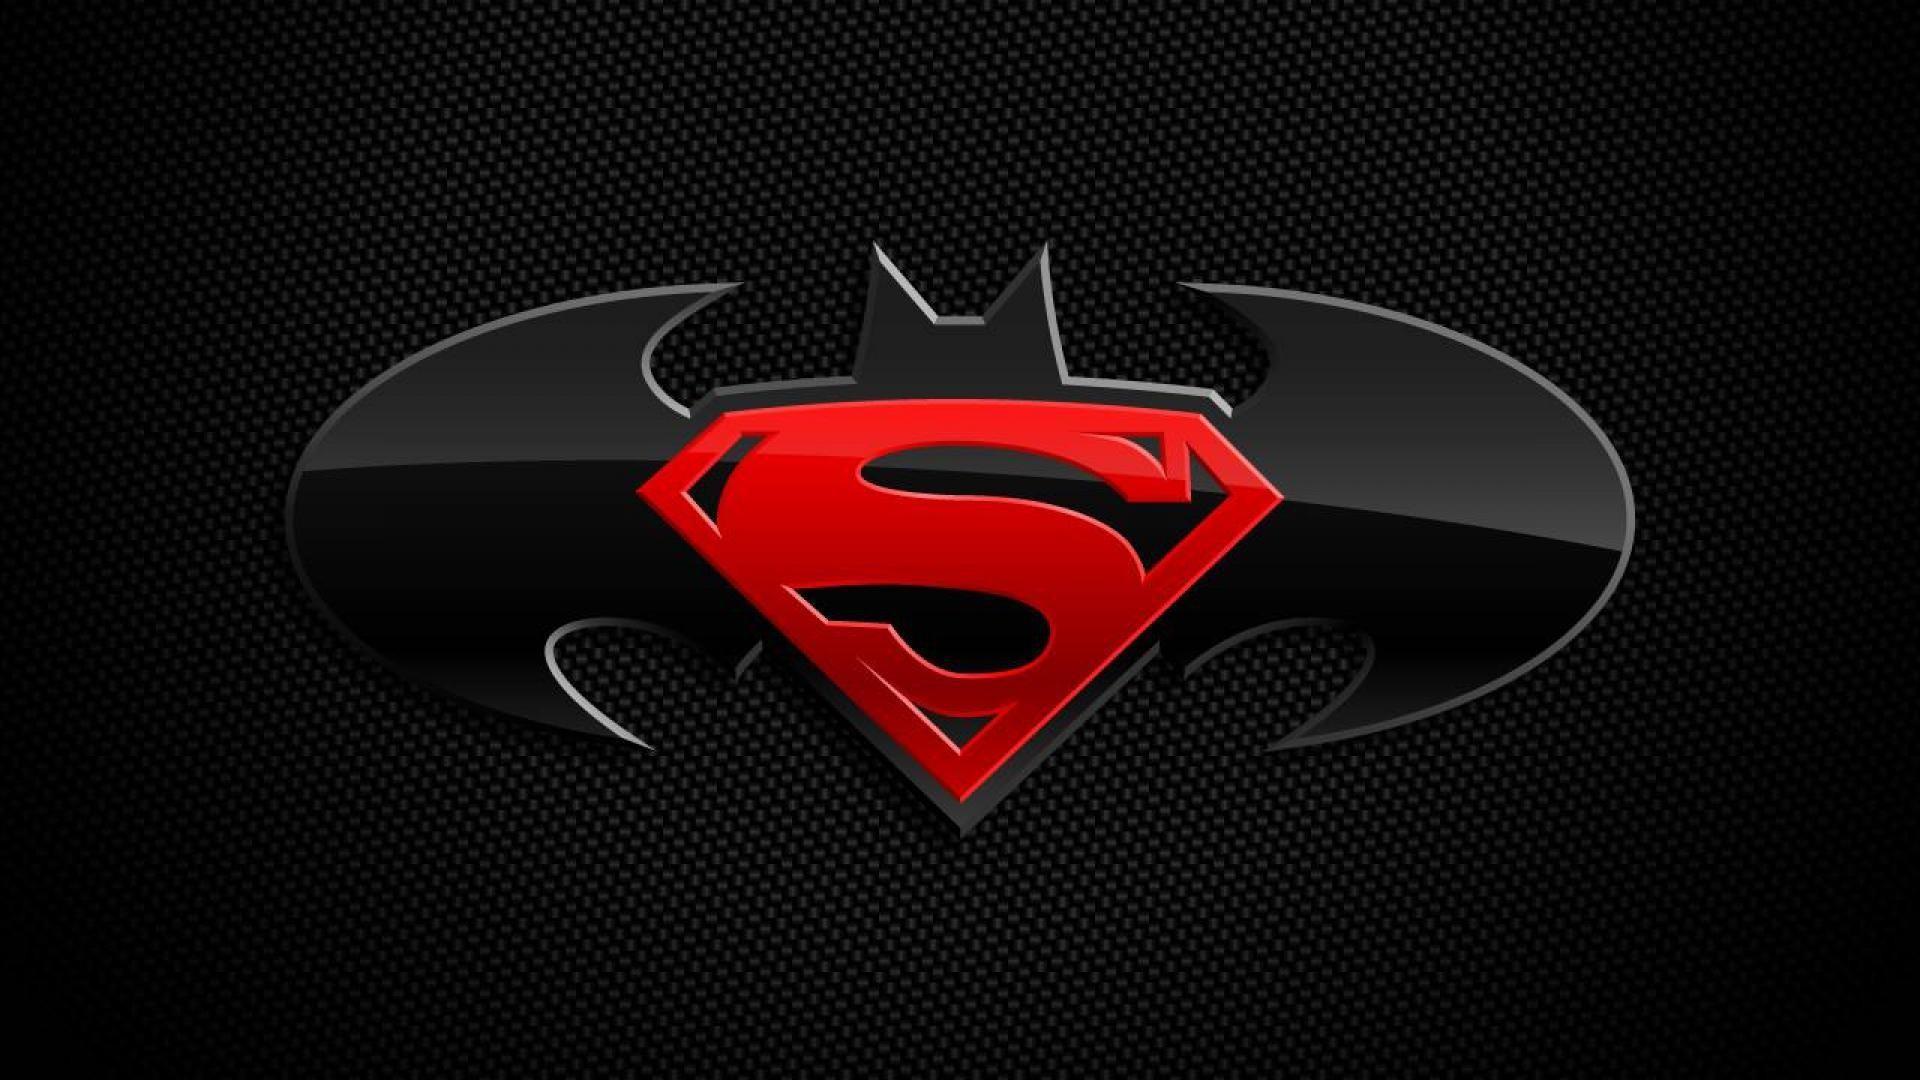 Wallpaper of superman logo 66 pictures 1920x1080 superman logo ipad wallpaper download free voltagebd Choice Image